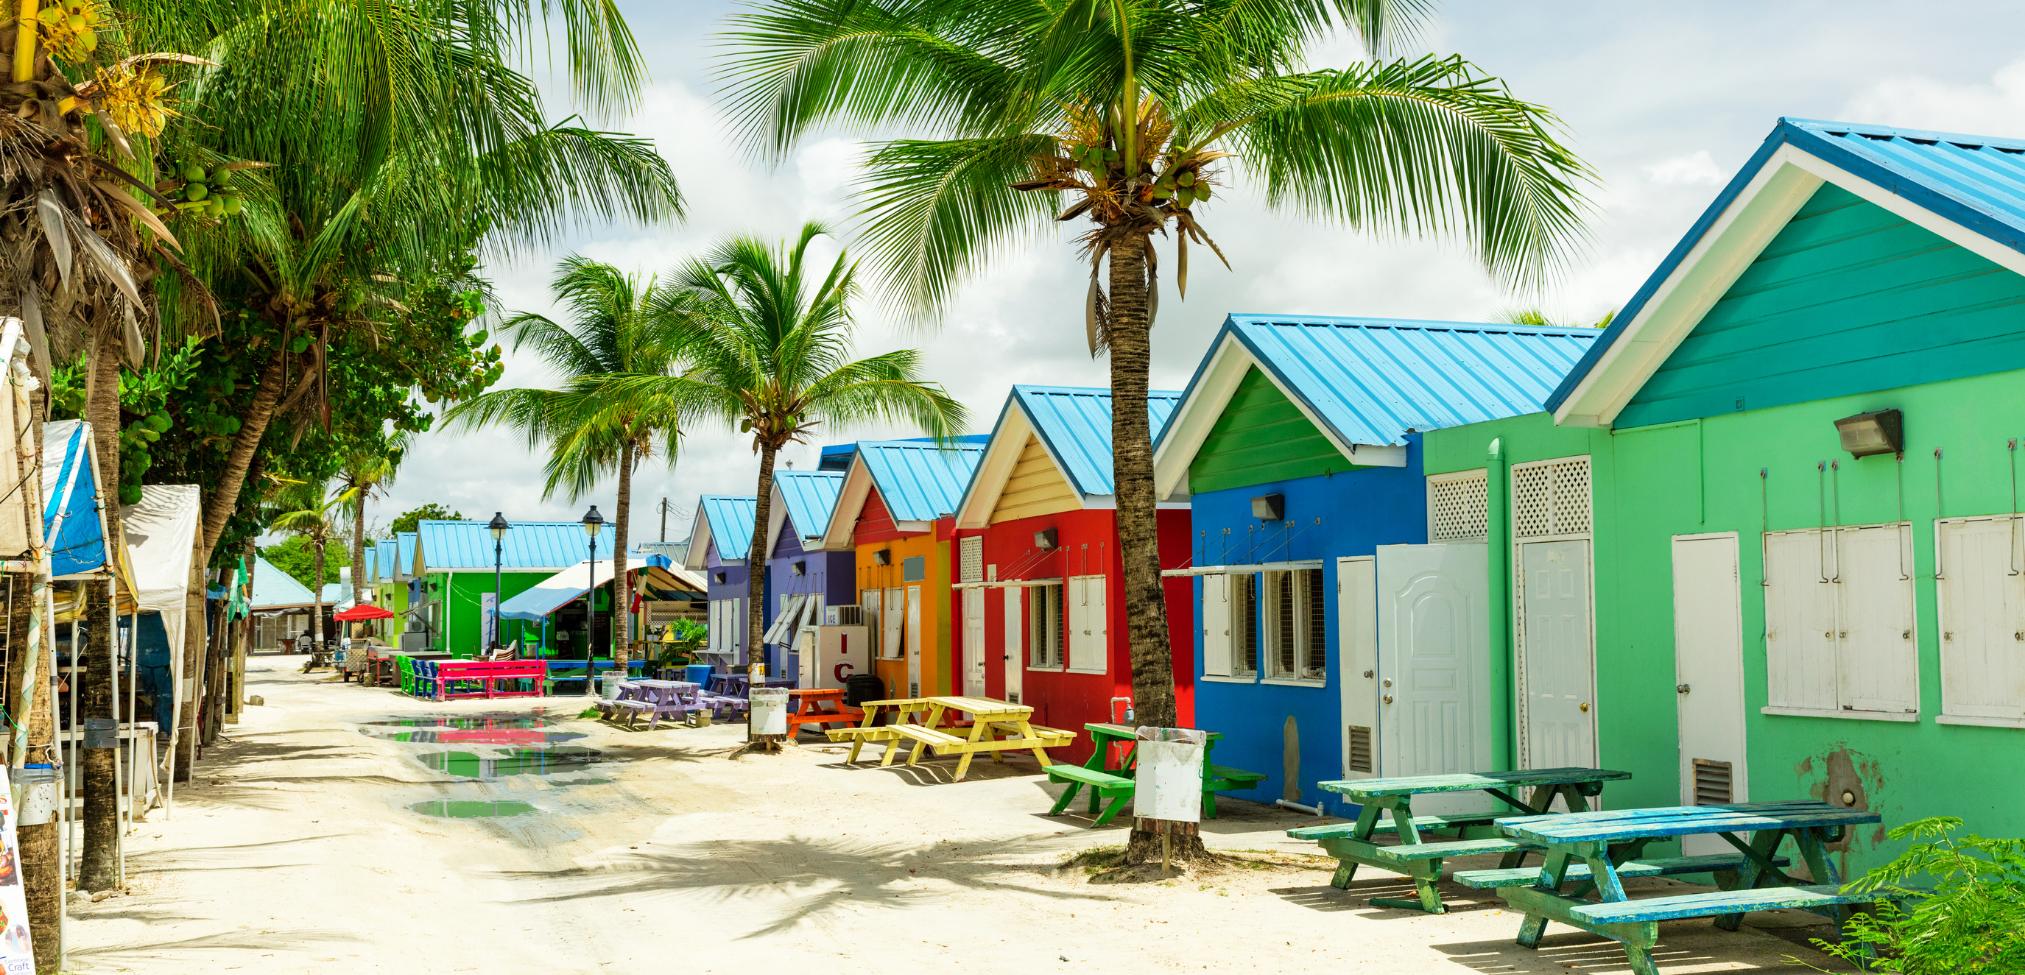 Urlaub Karibik Reiseziele